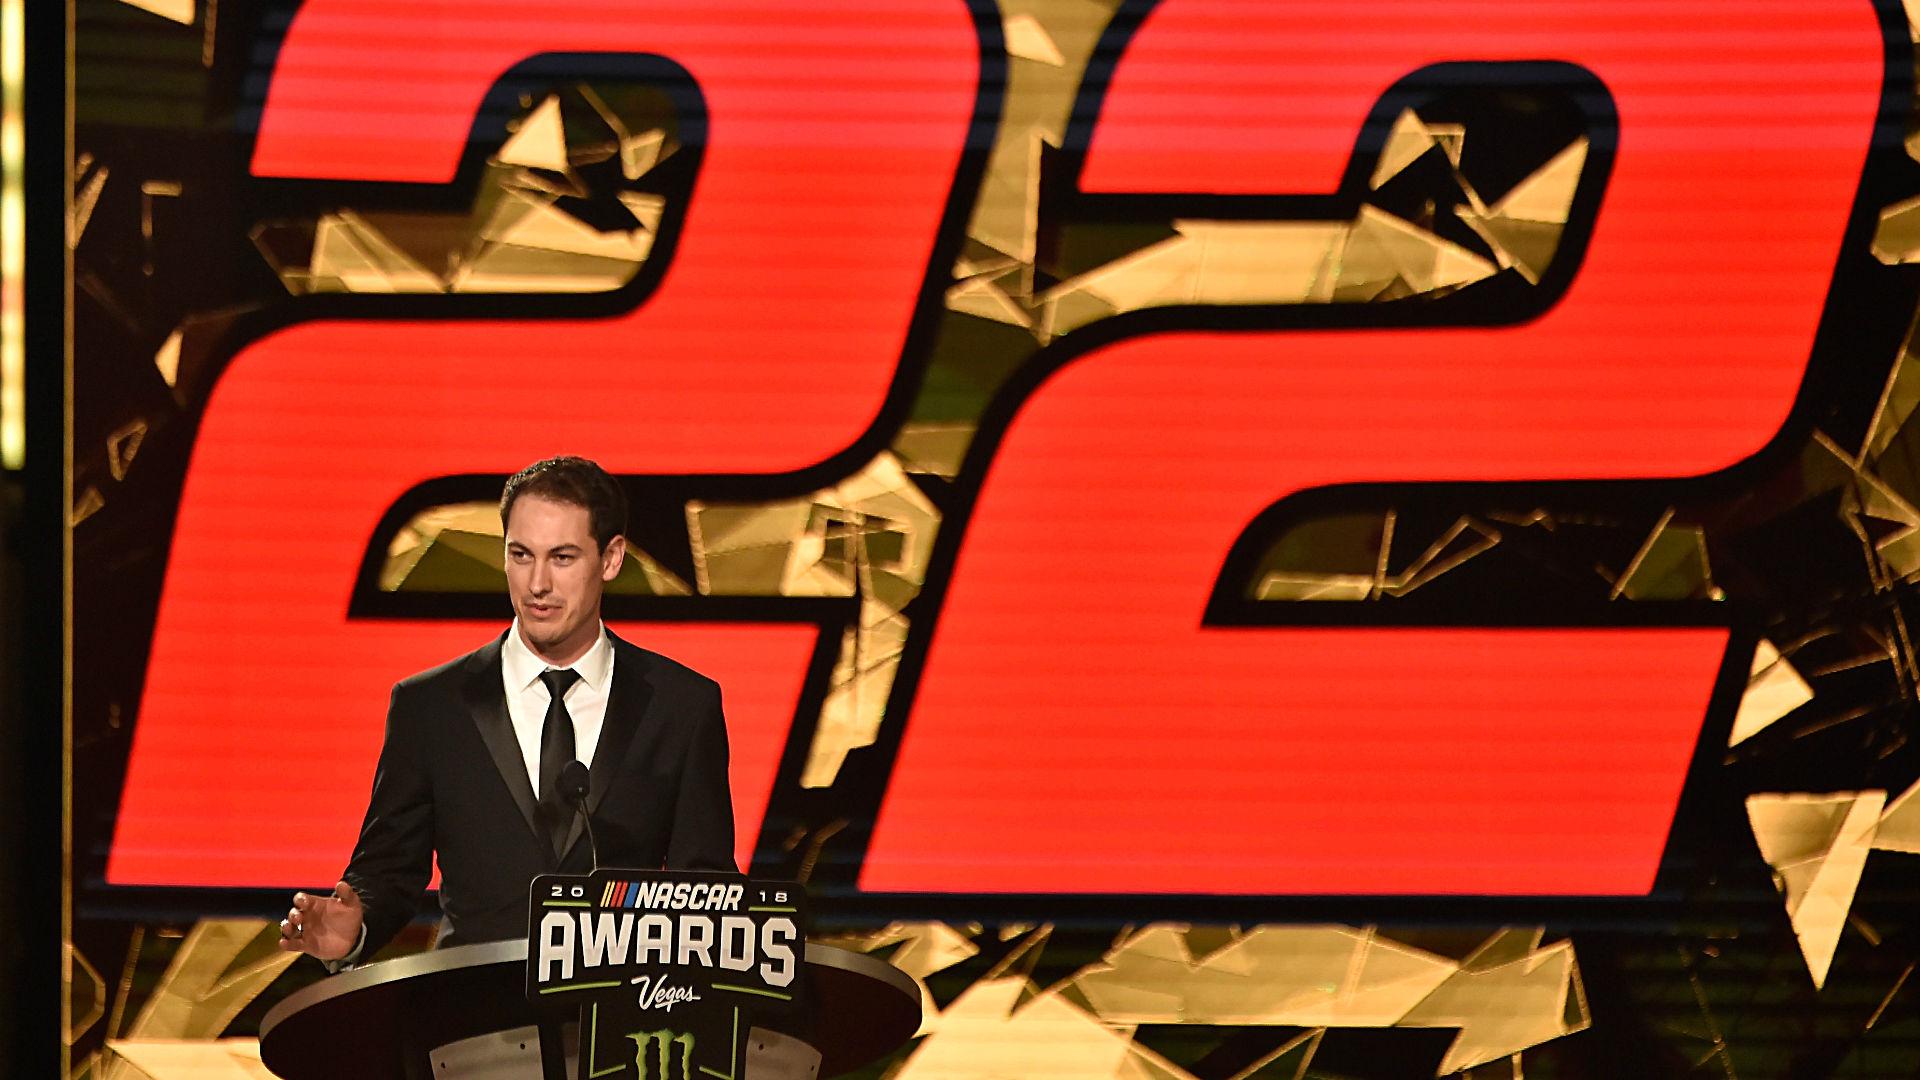 Joey Logano champions foundation during NASCAR awards show speech